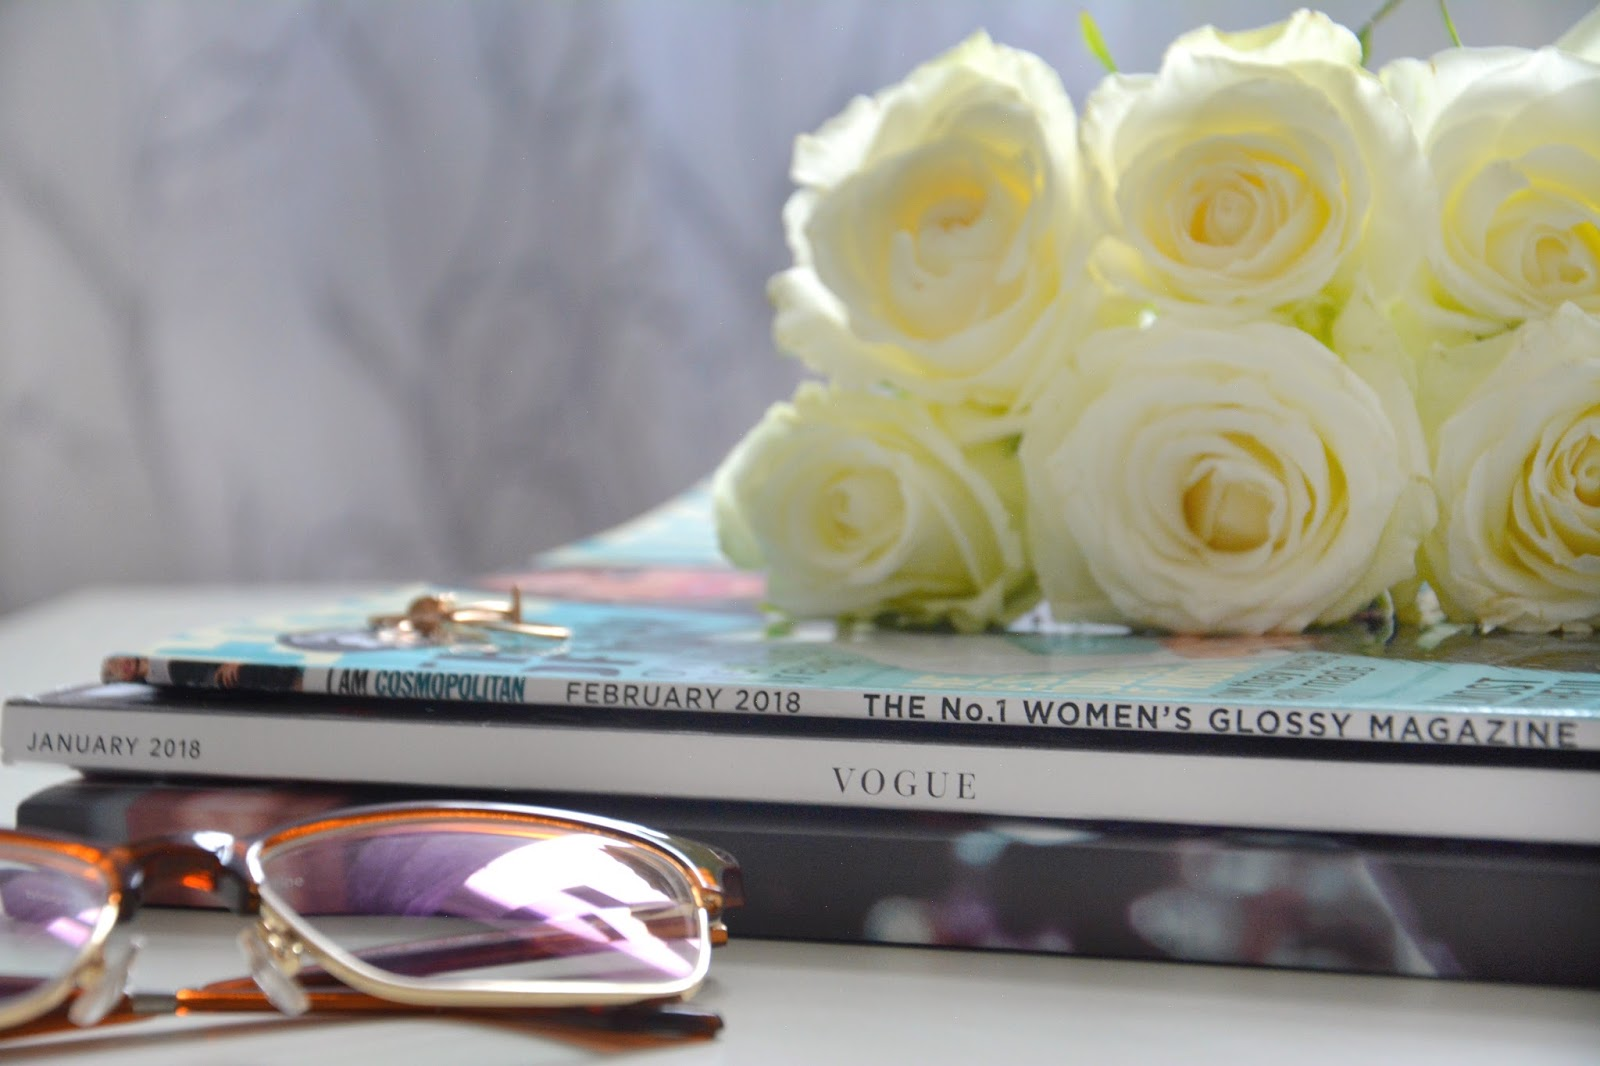 Blogosphere; Vogue; Cosmopolitan; Glasseshop.com Glasses; Huda Beauty Contour & Strobe Set Muse & Angelic; Primark Rings; Fresh Roses